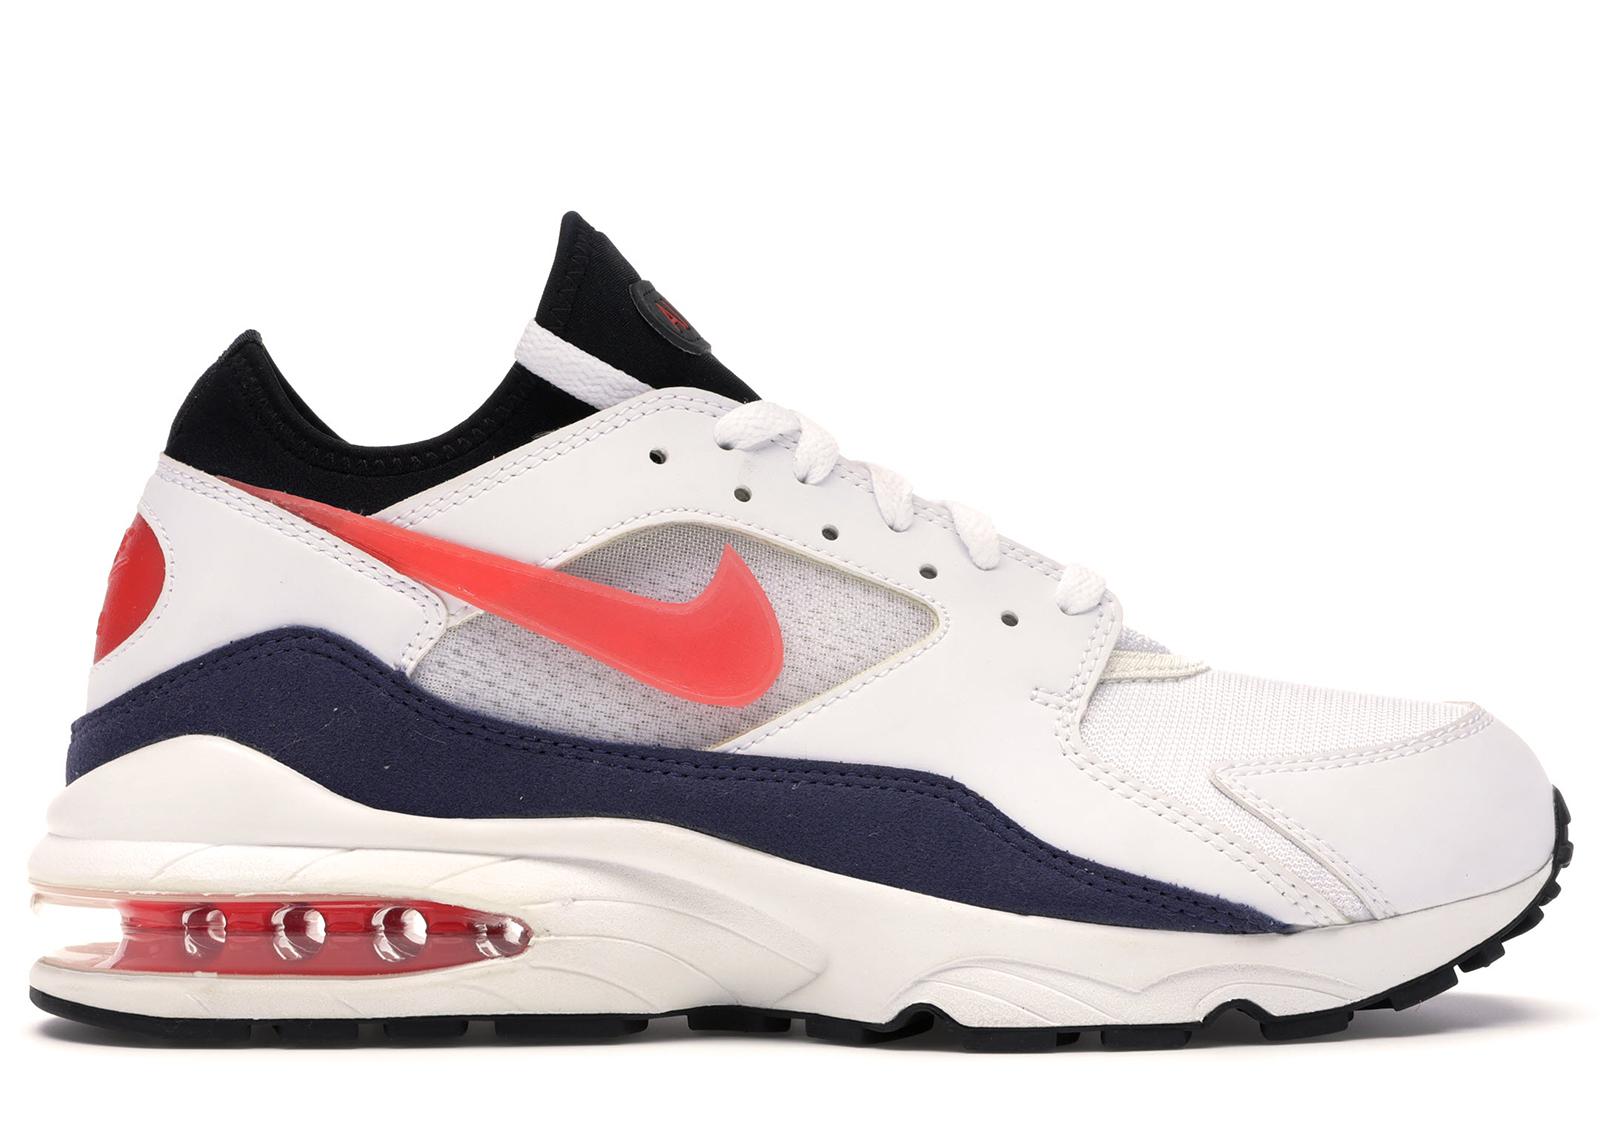 Nike Air Max 93 Habanero Red